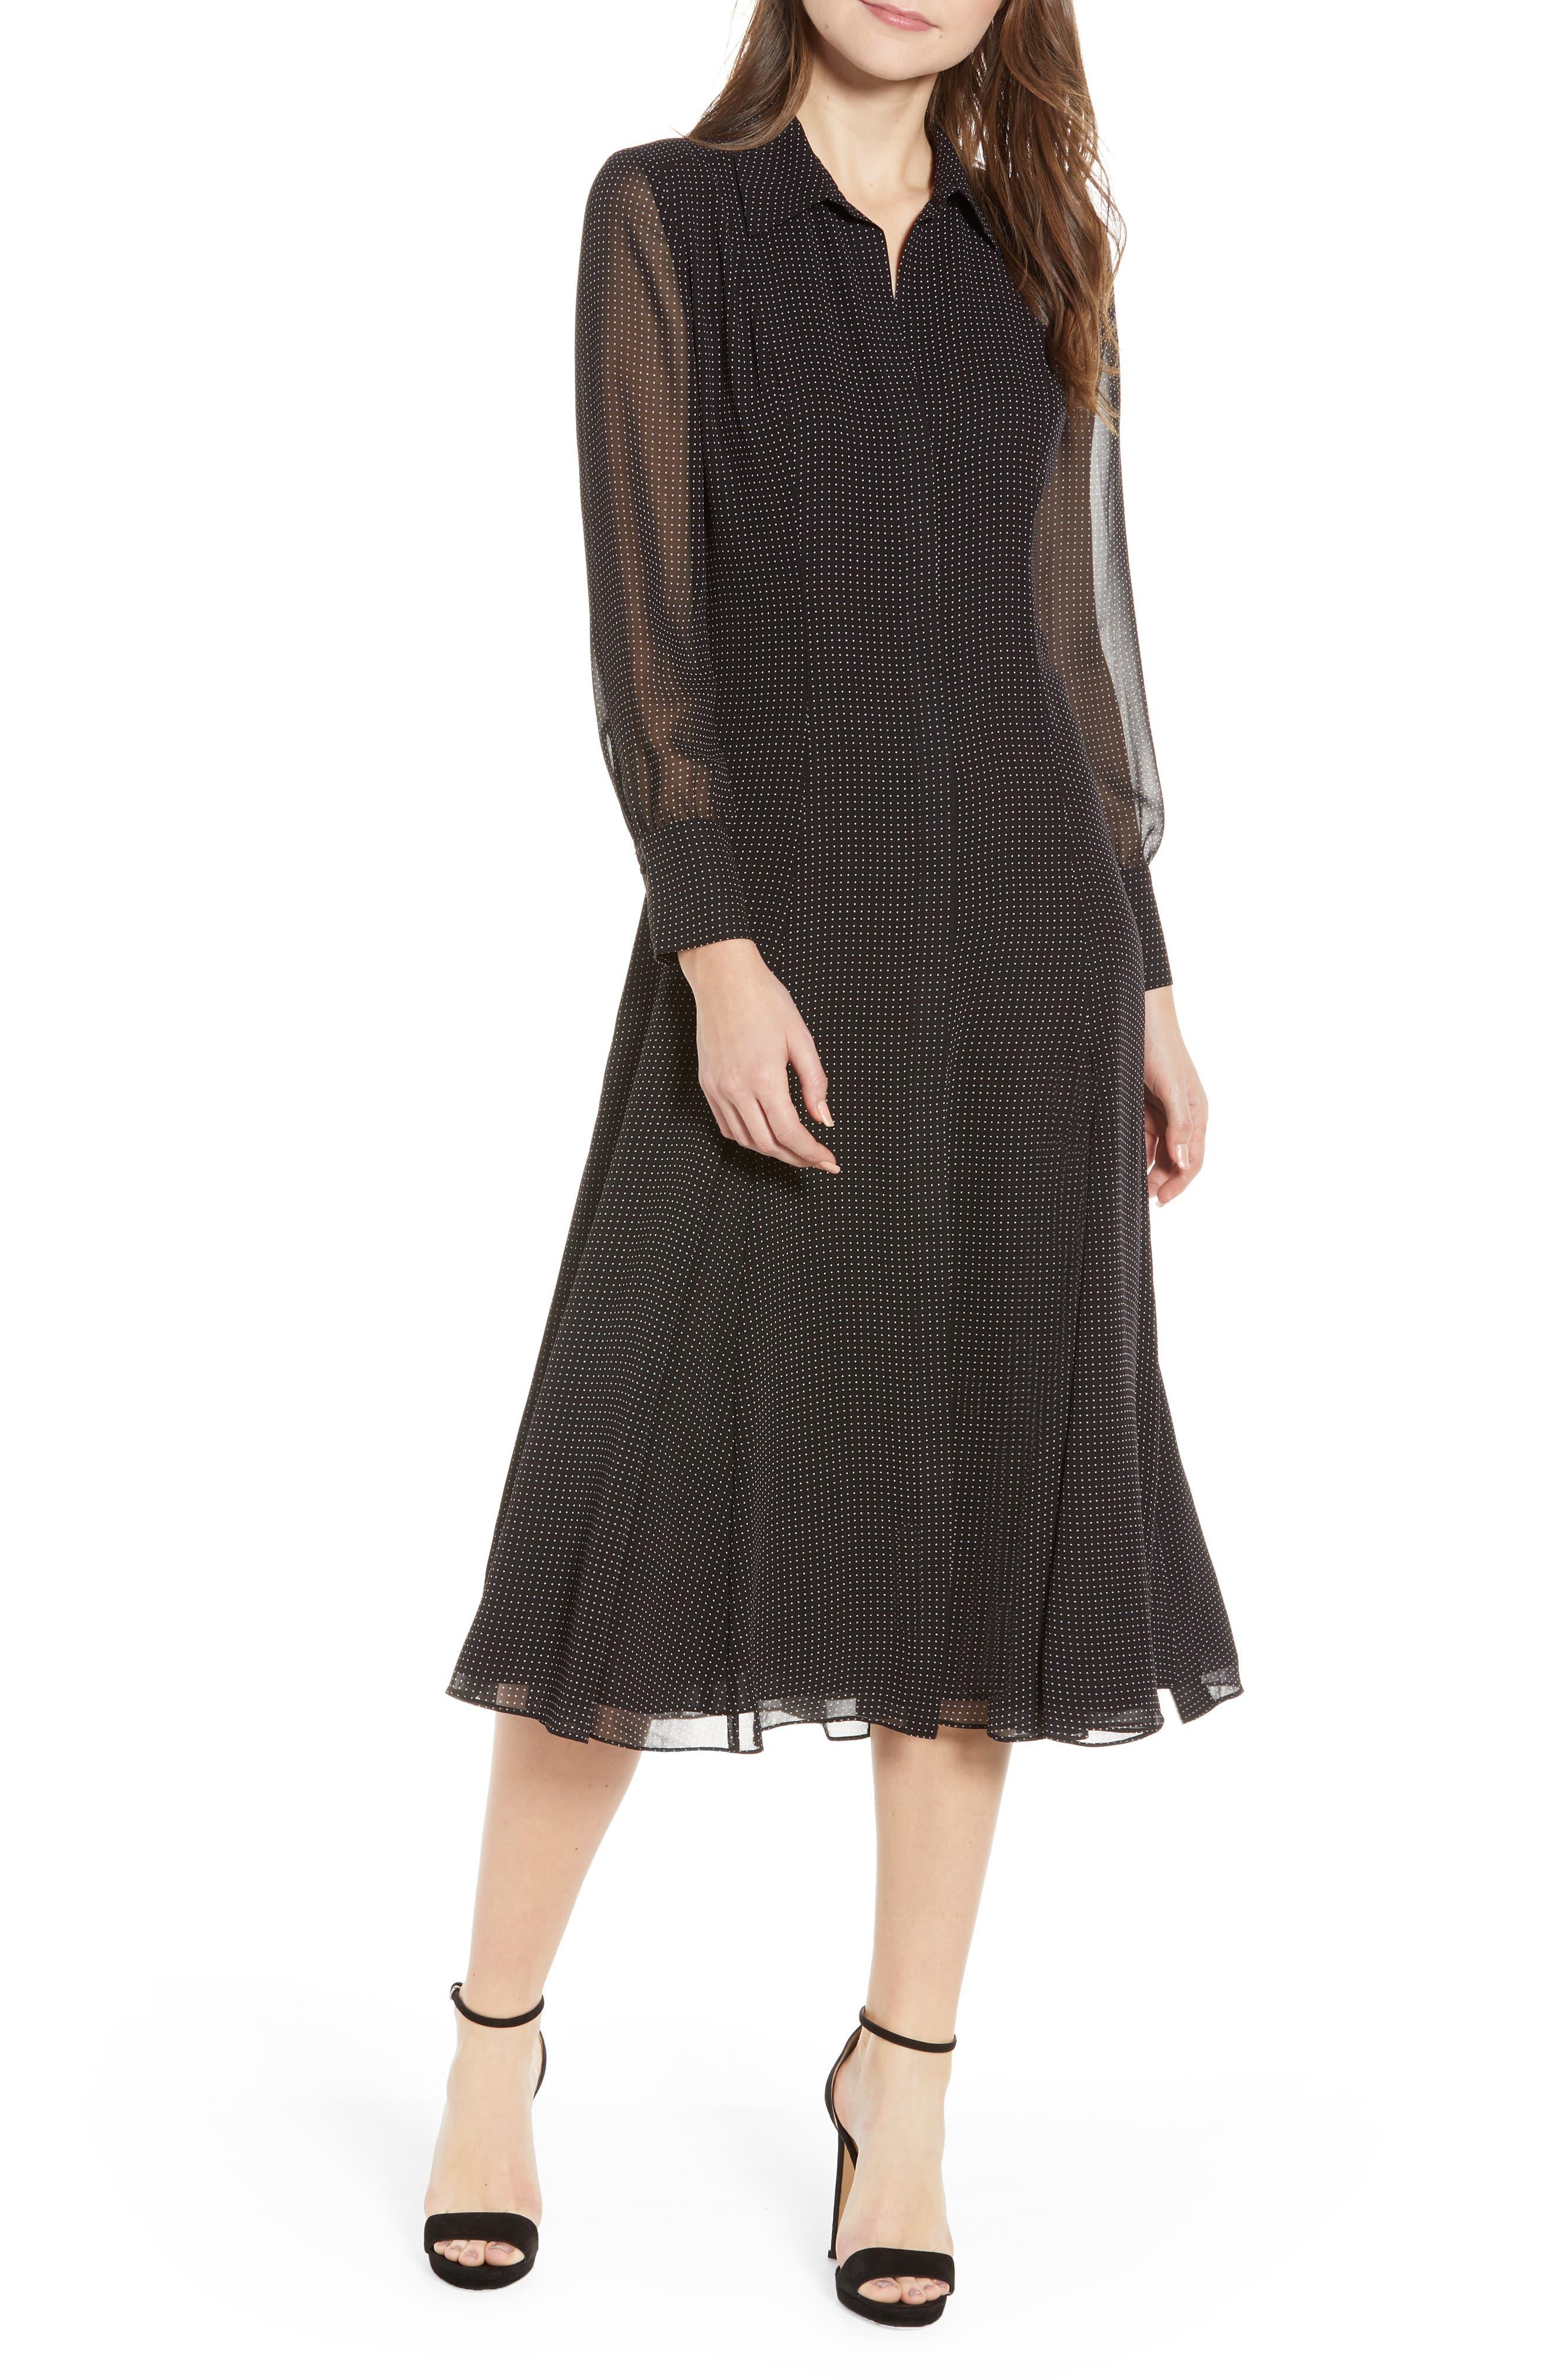 REBECCA MINKOFF Kimberly Dot Sheer Sleeve Dress, Main, color, BLACK/ WHITE